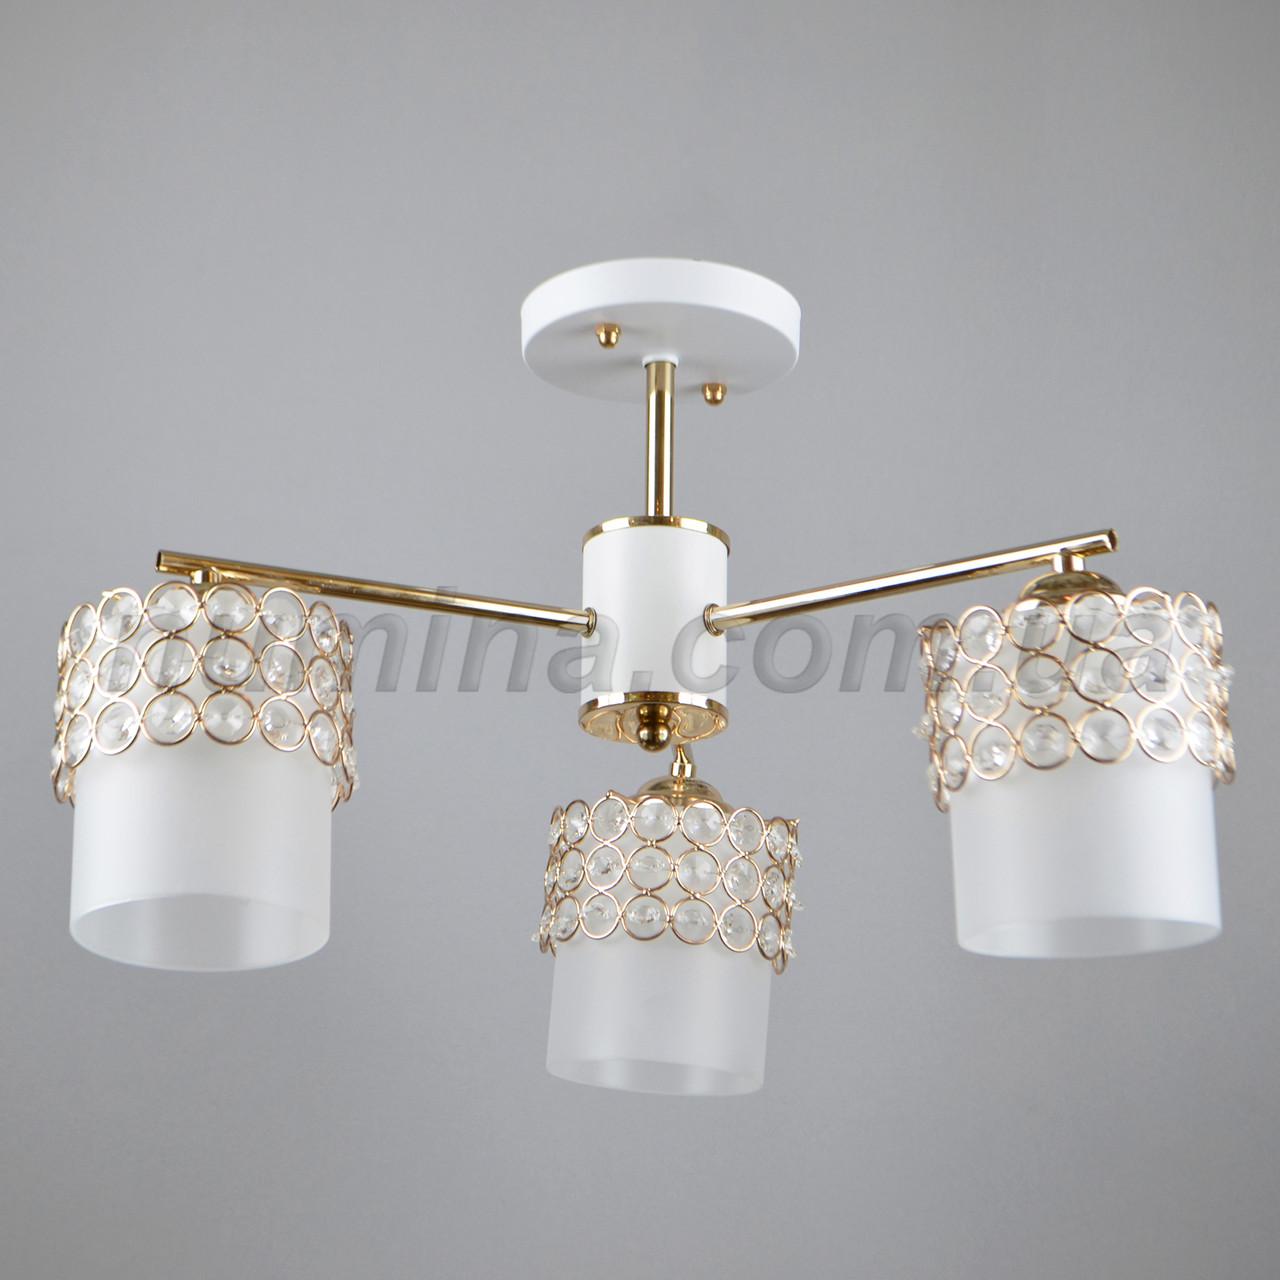 Люстра потолочная на три лампы 29-C779-3 FGD+WT